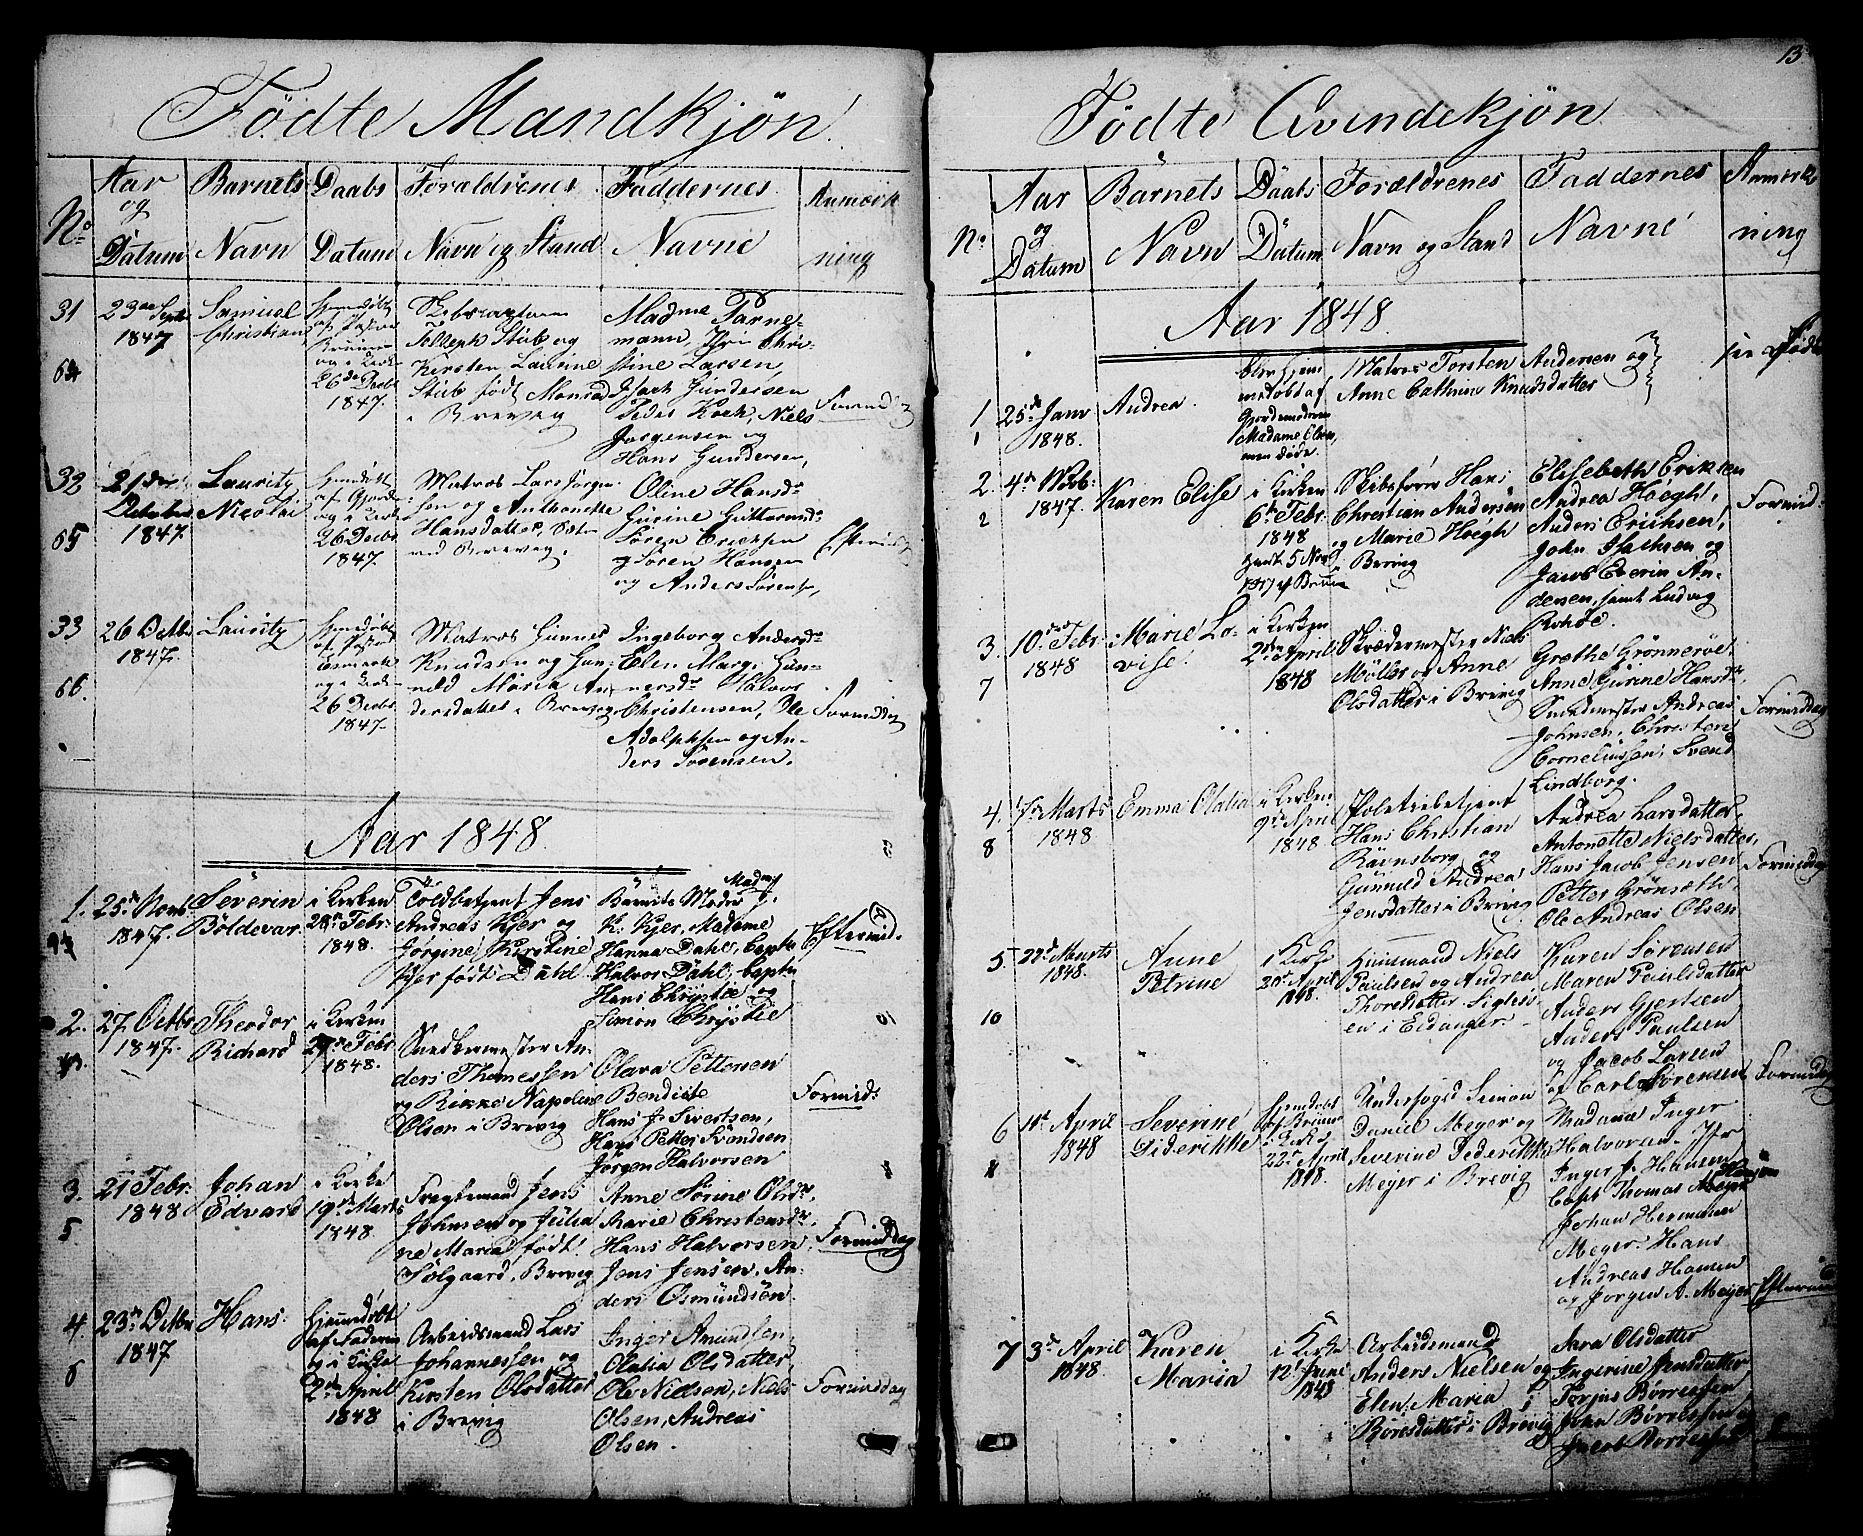 SAKO, Brevik kirkebøker, G/Ga/L0002: Klokkerbok nr. 2, 1846-1865, s. 13